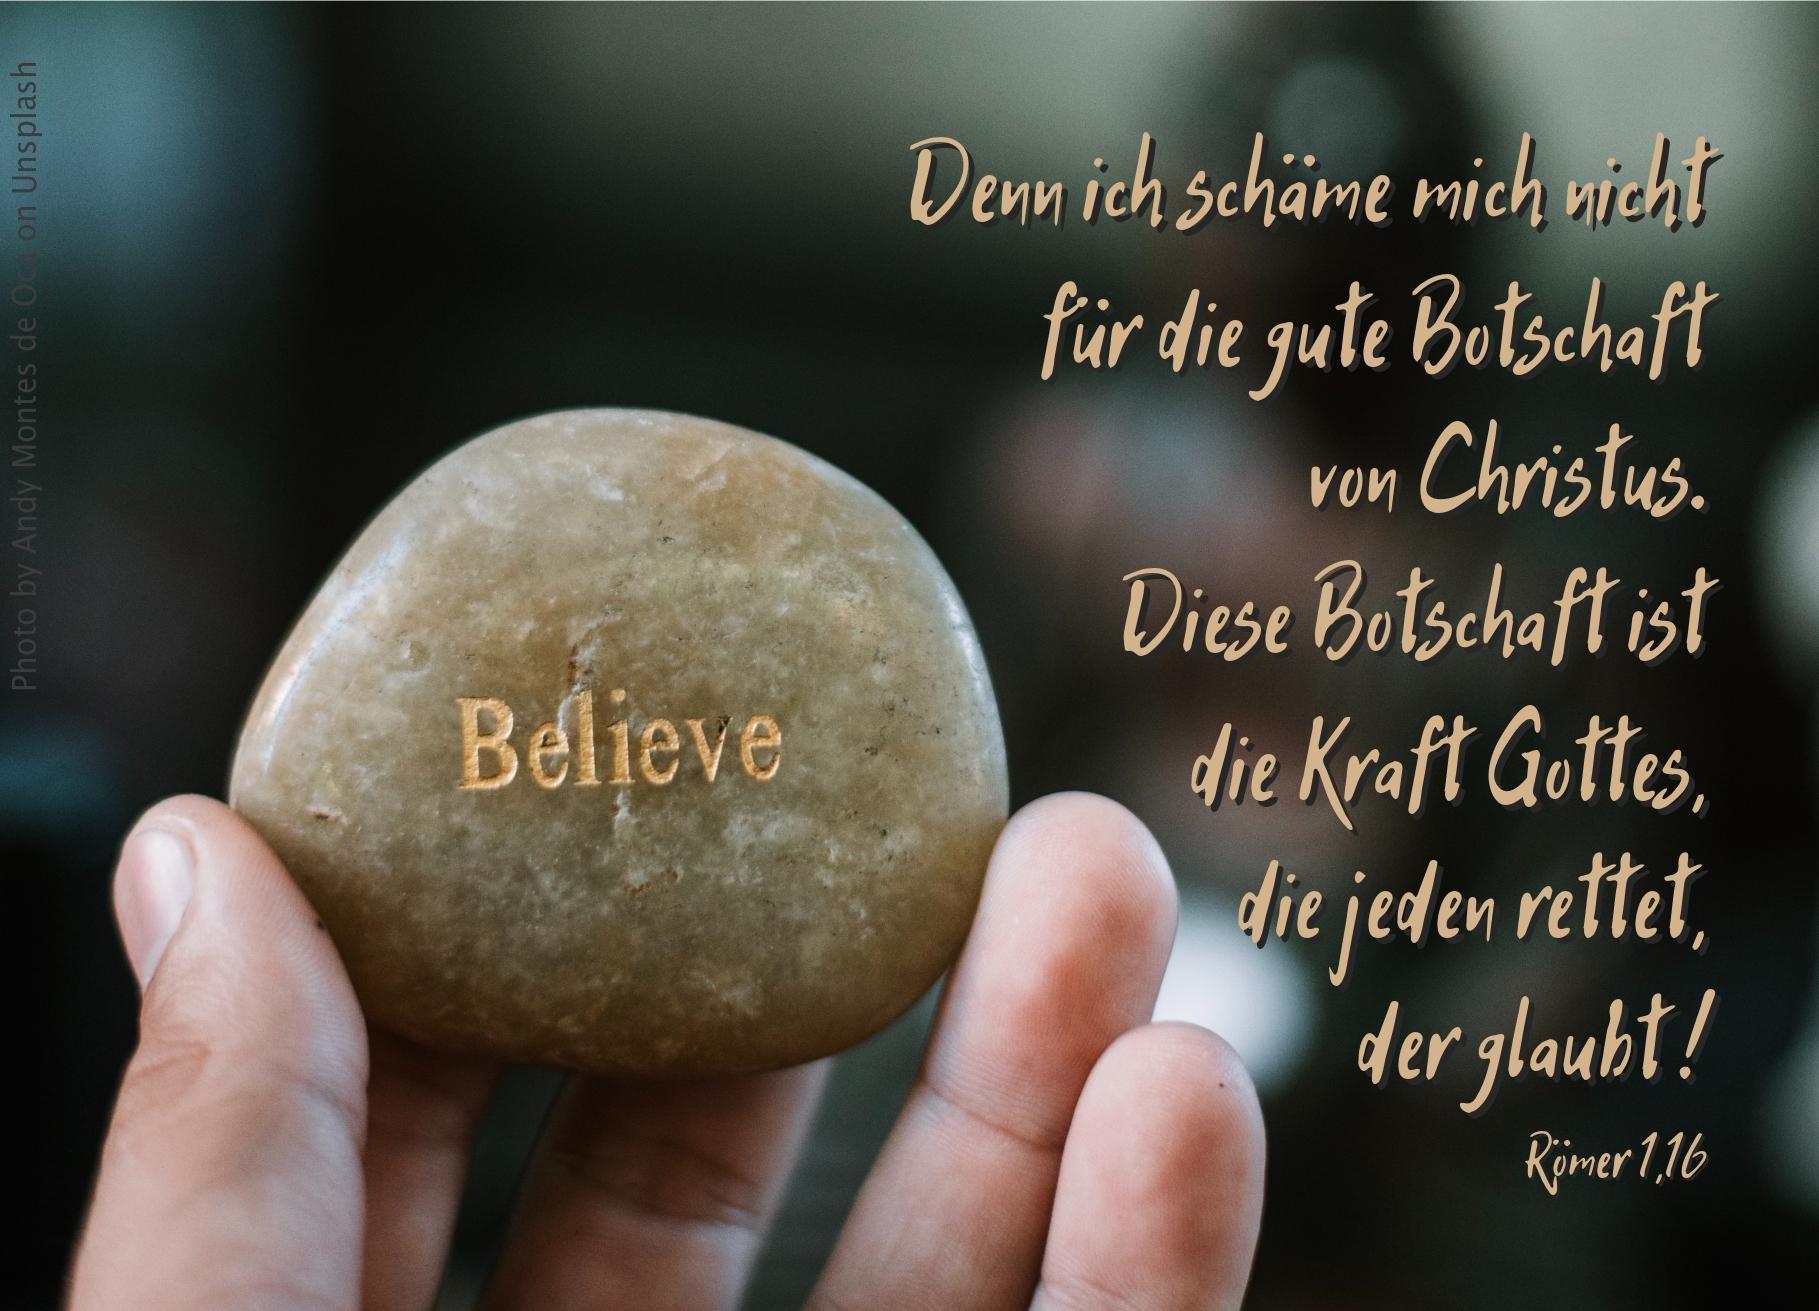 "alt=""stein_mit_aufschrift_believe_erwartet_bibelhoerbuch_gottes_gute_botschaft"""